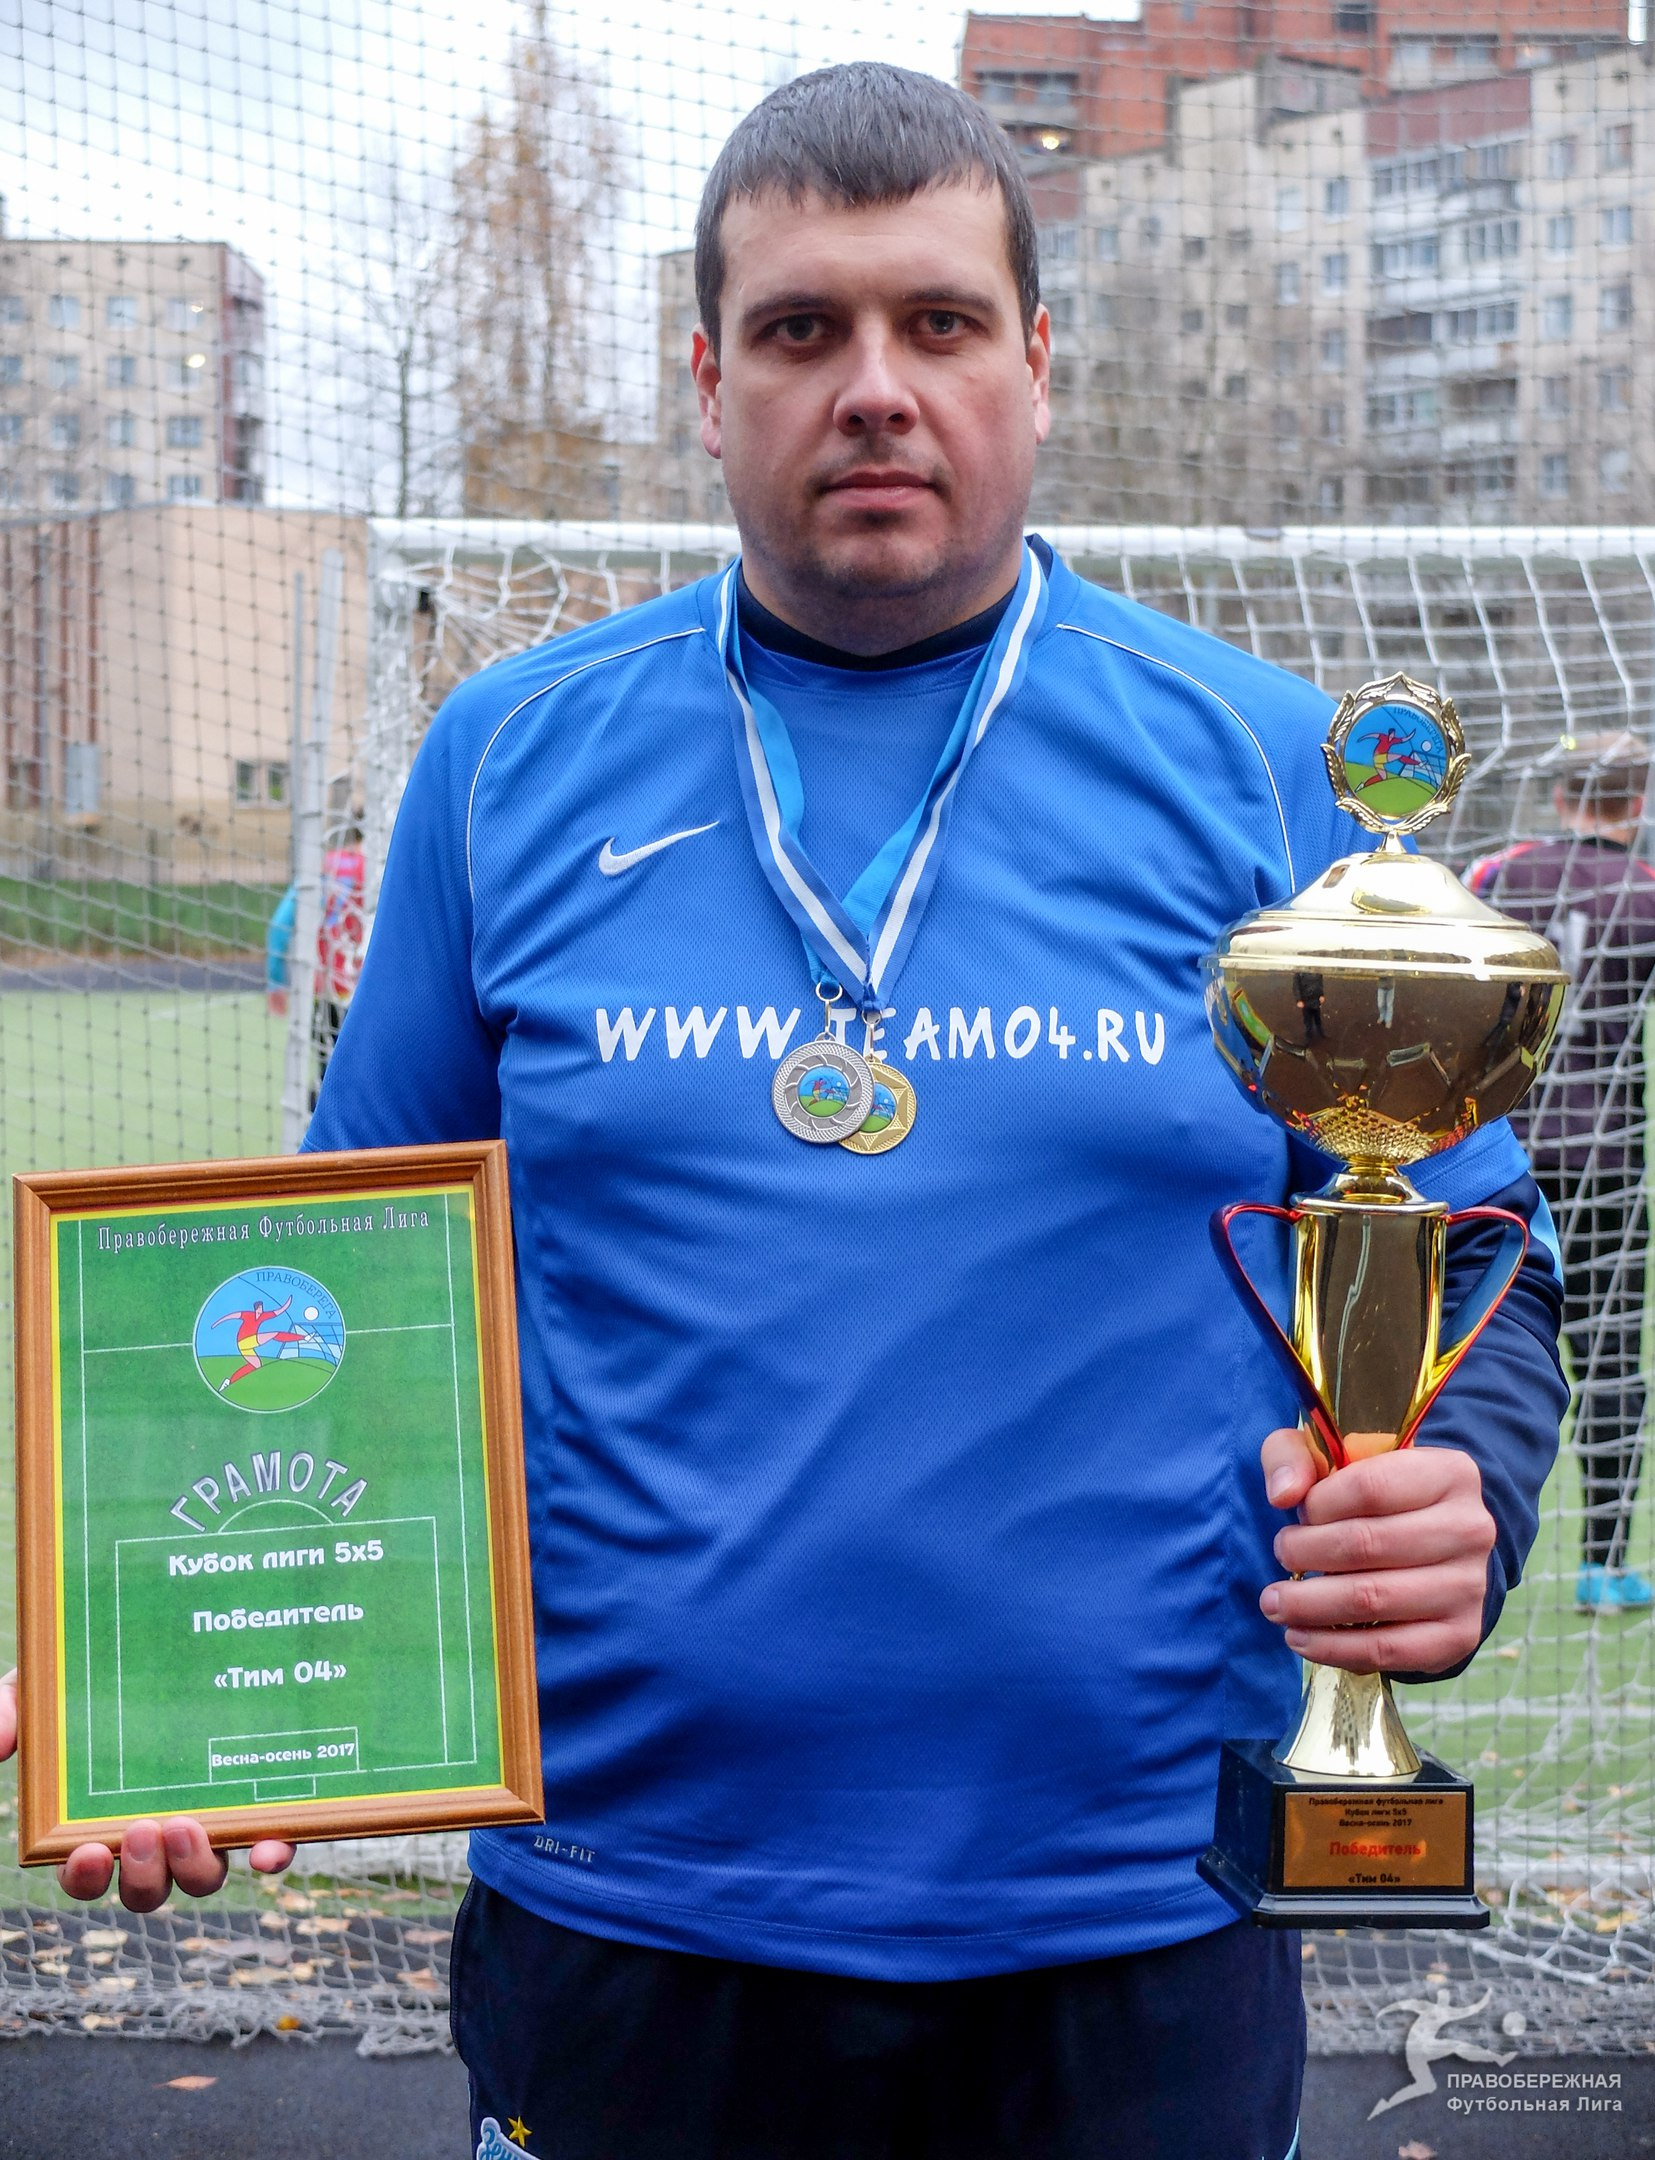 Антон Беляев (